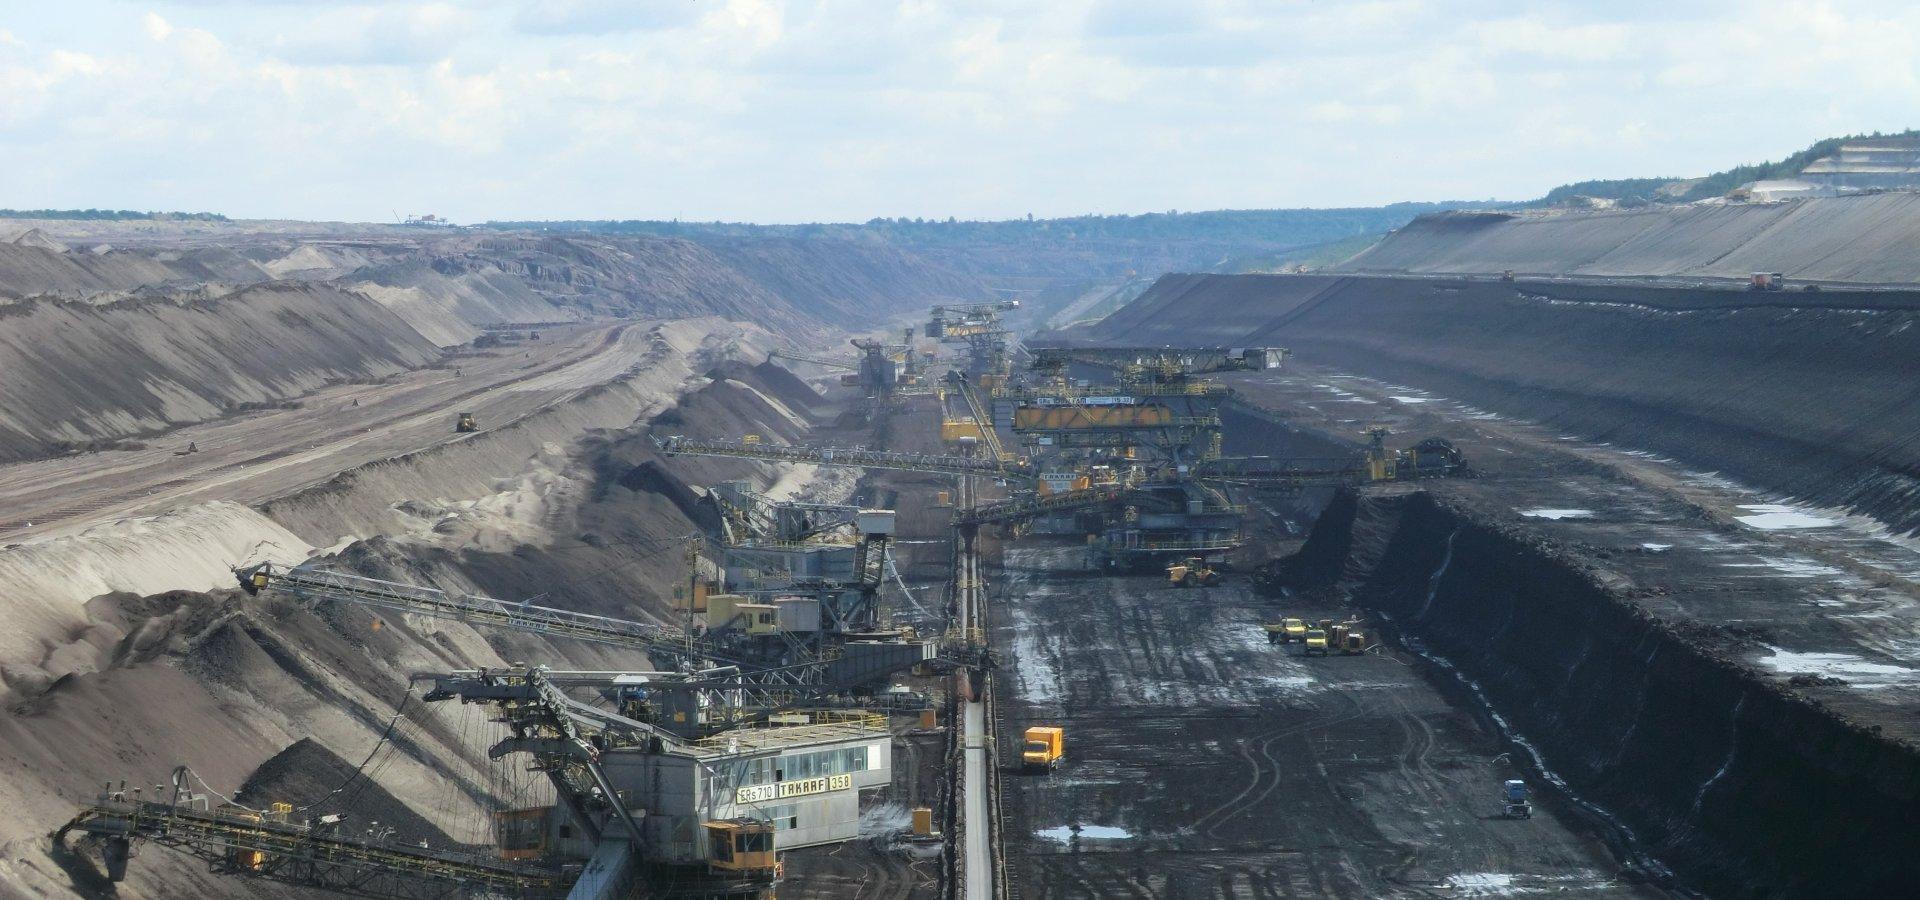 Welzow open-pit mine